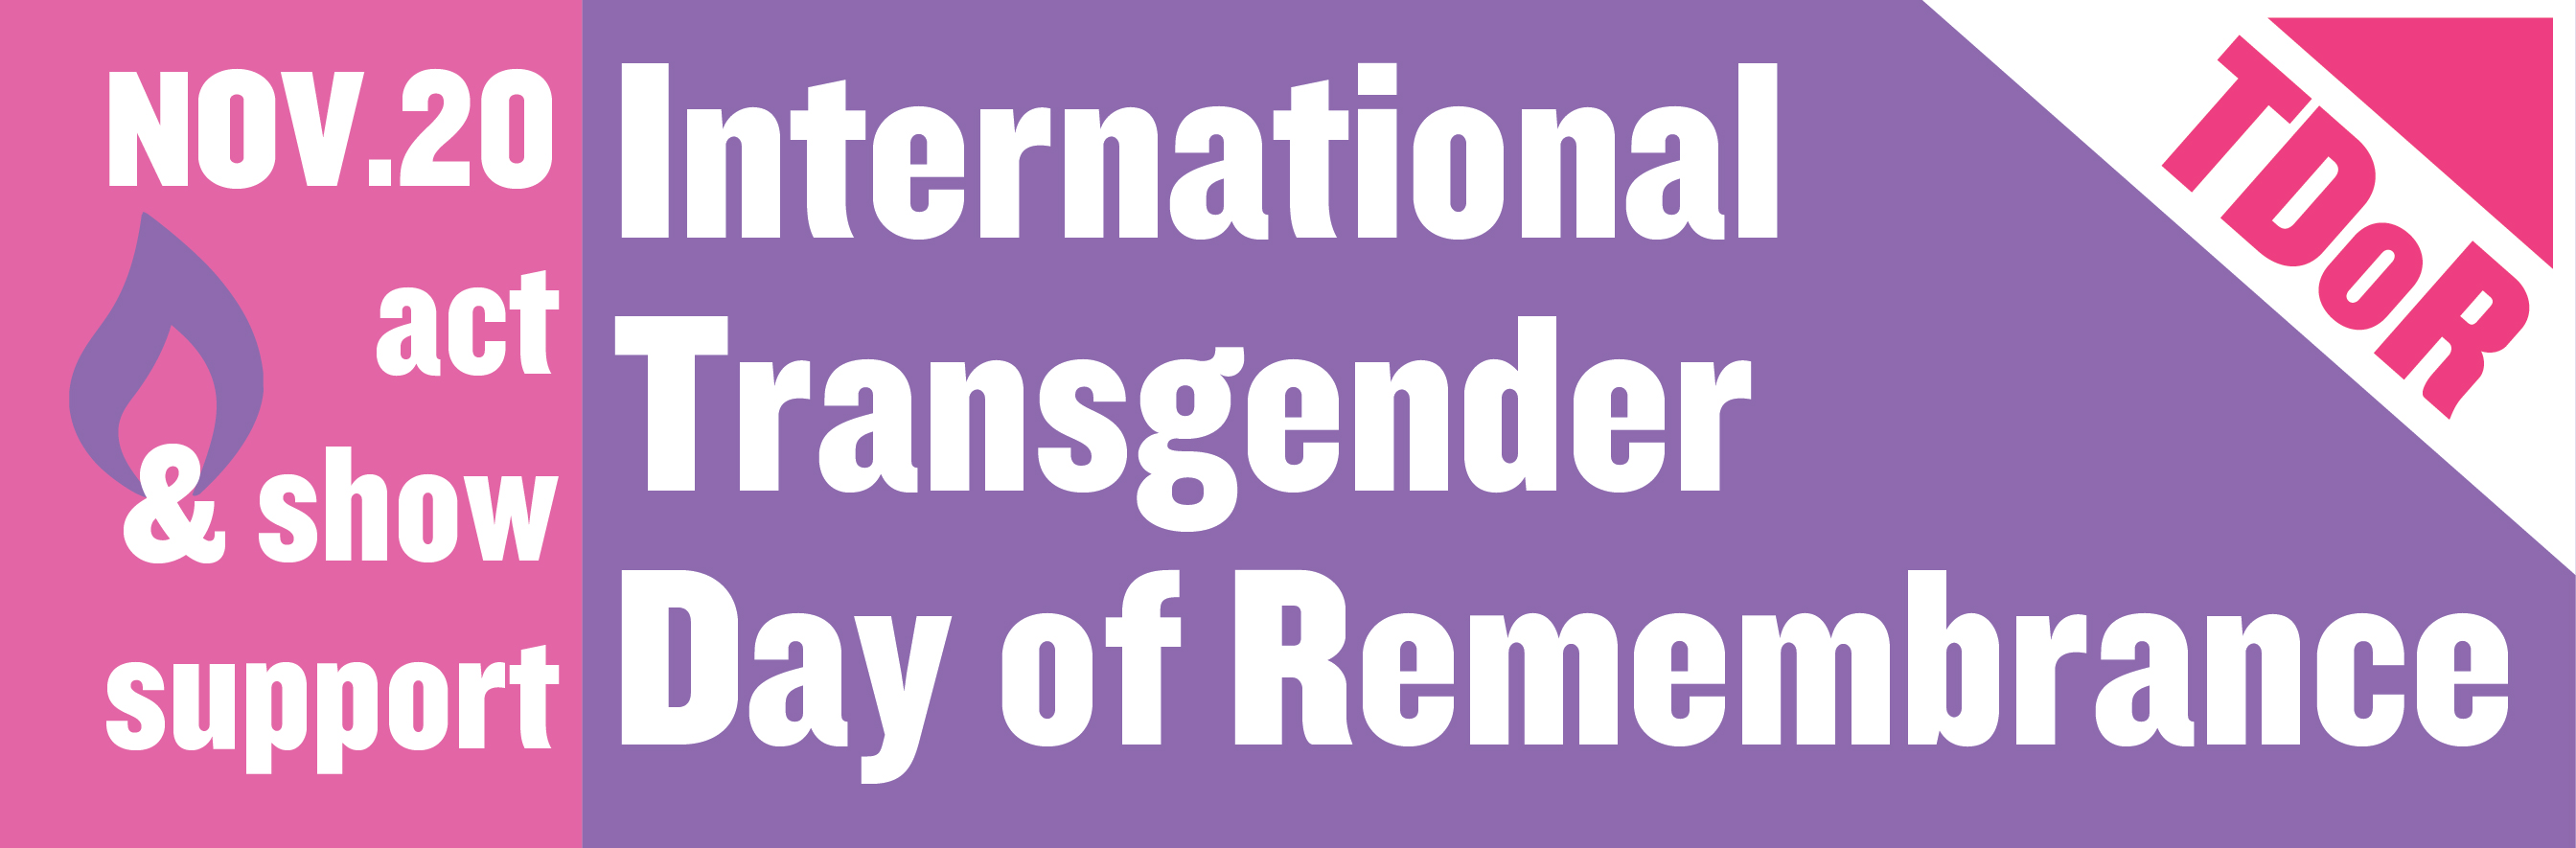 TransgenderDay-WEB